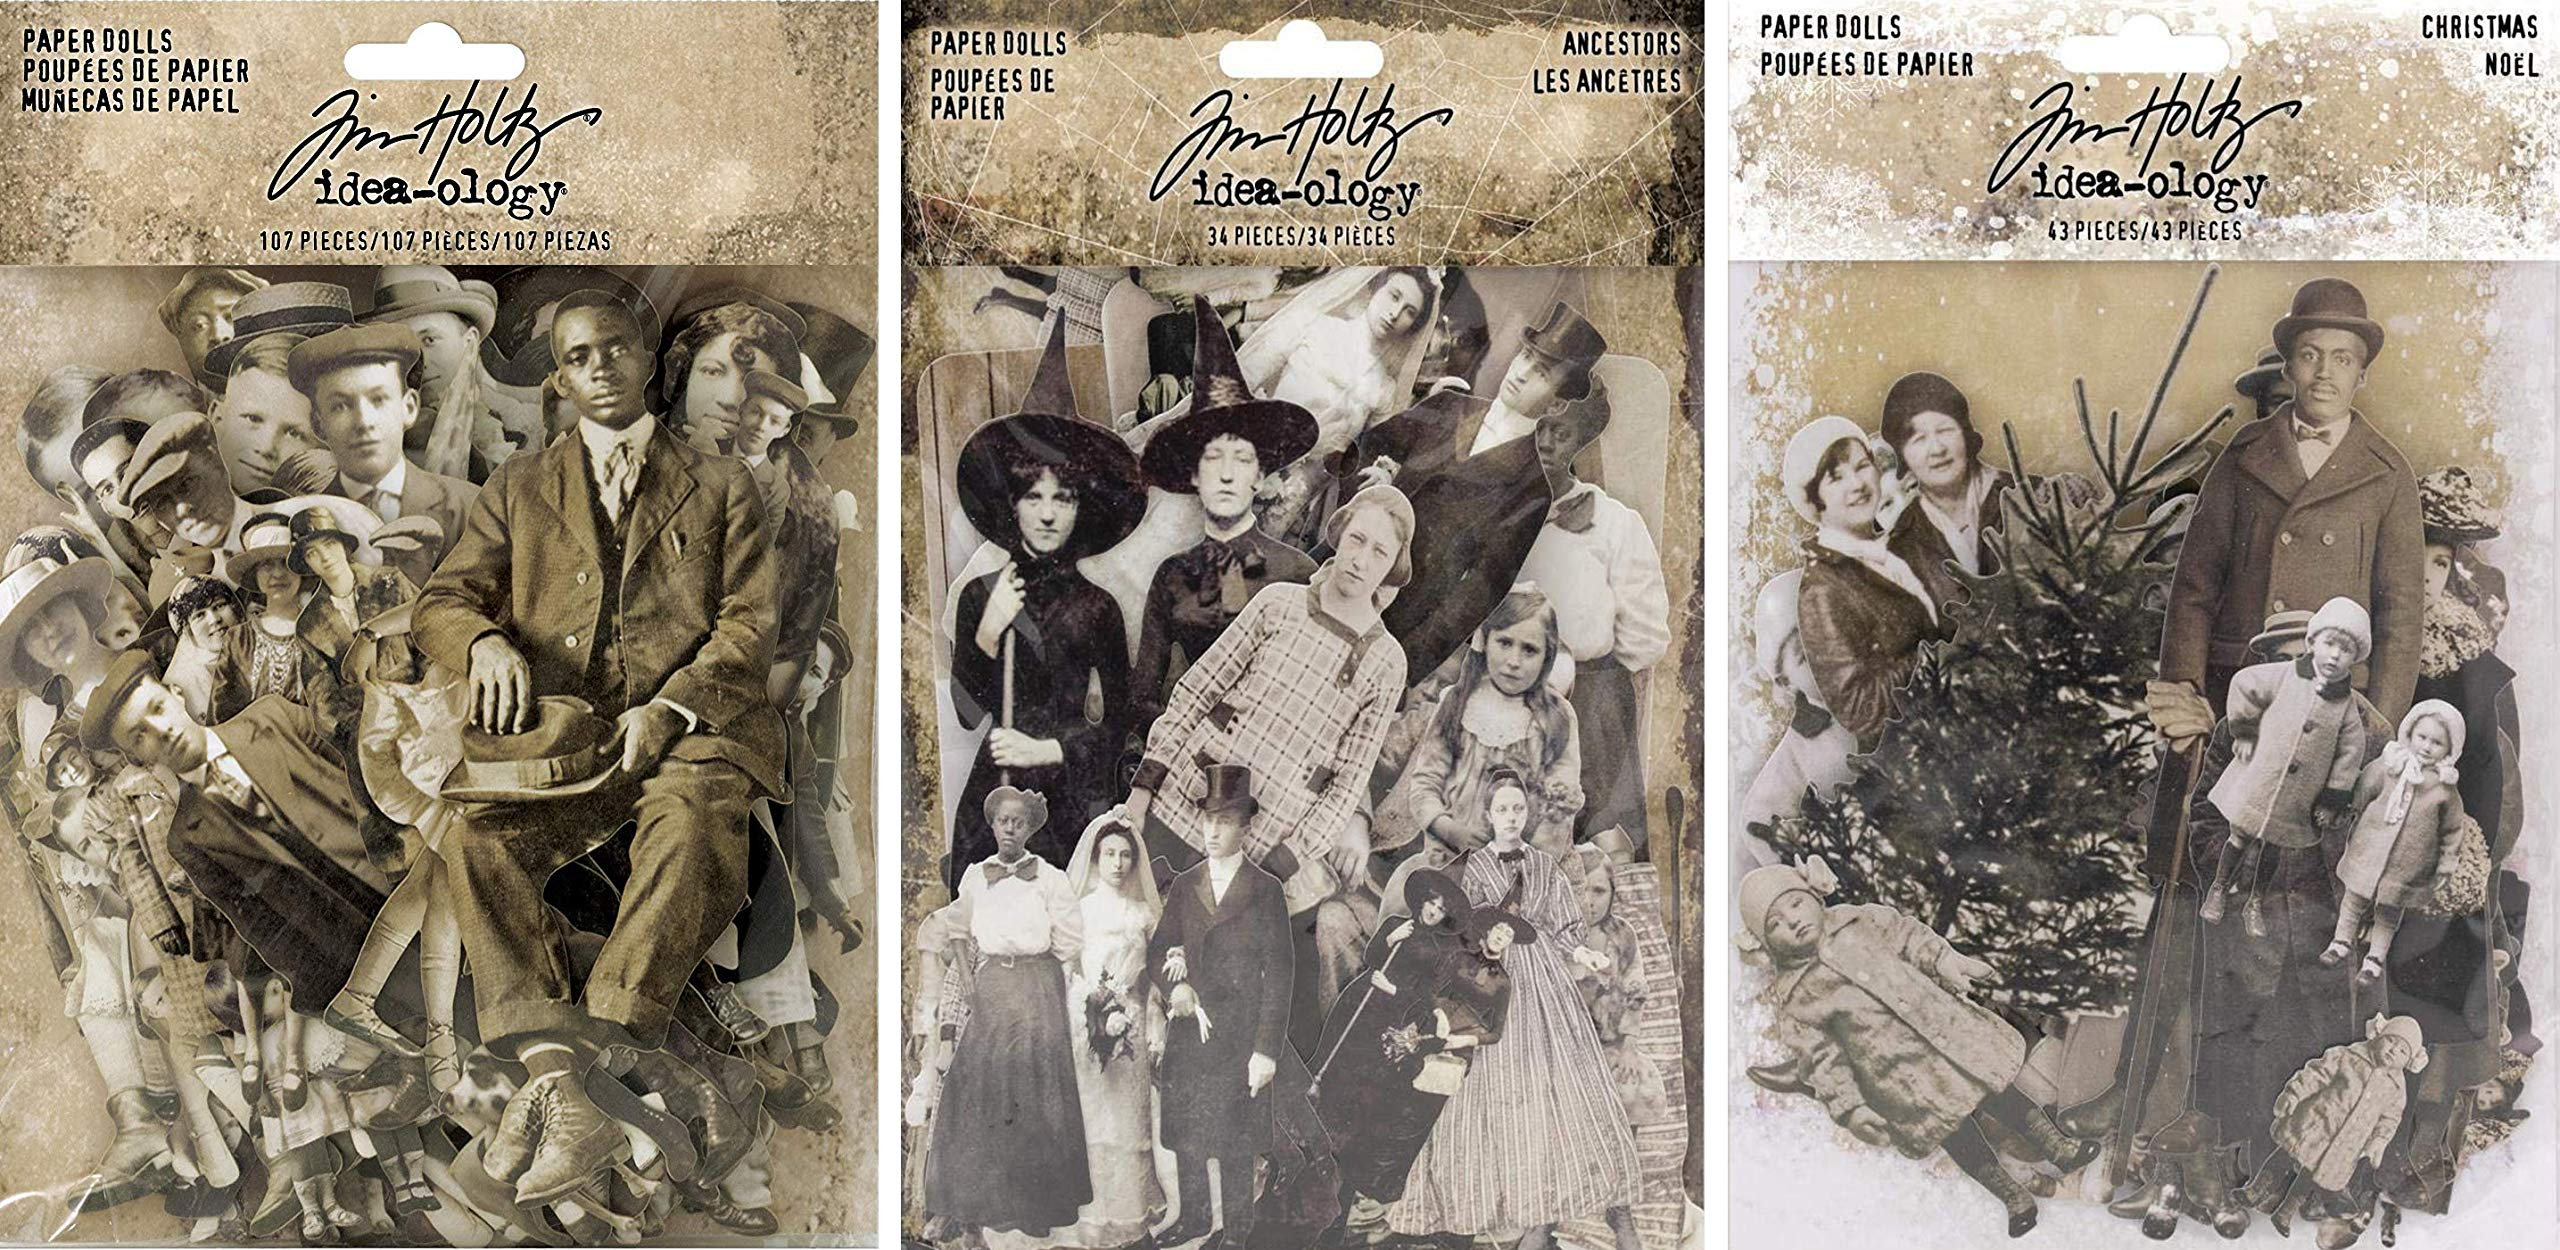 Tim Holtz Idea-Ology 2018 Paper Dolls, Ancestors Paper Dolls and Christmas Paper Dolls - 3 Item Bundle